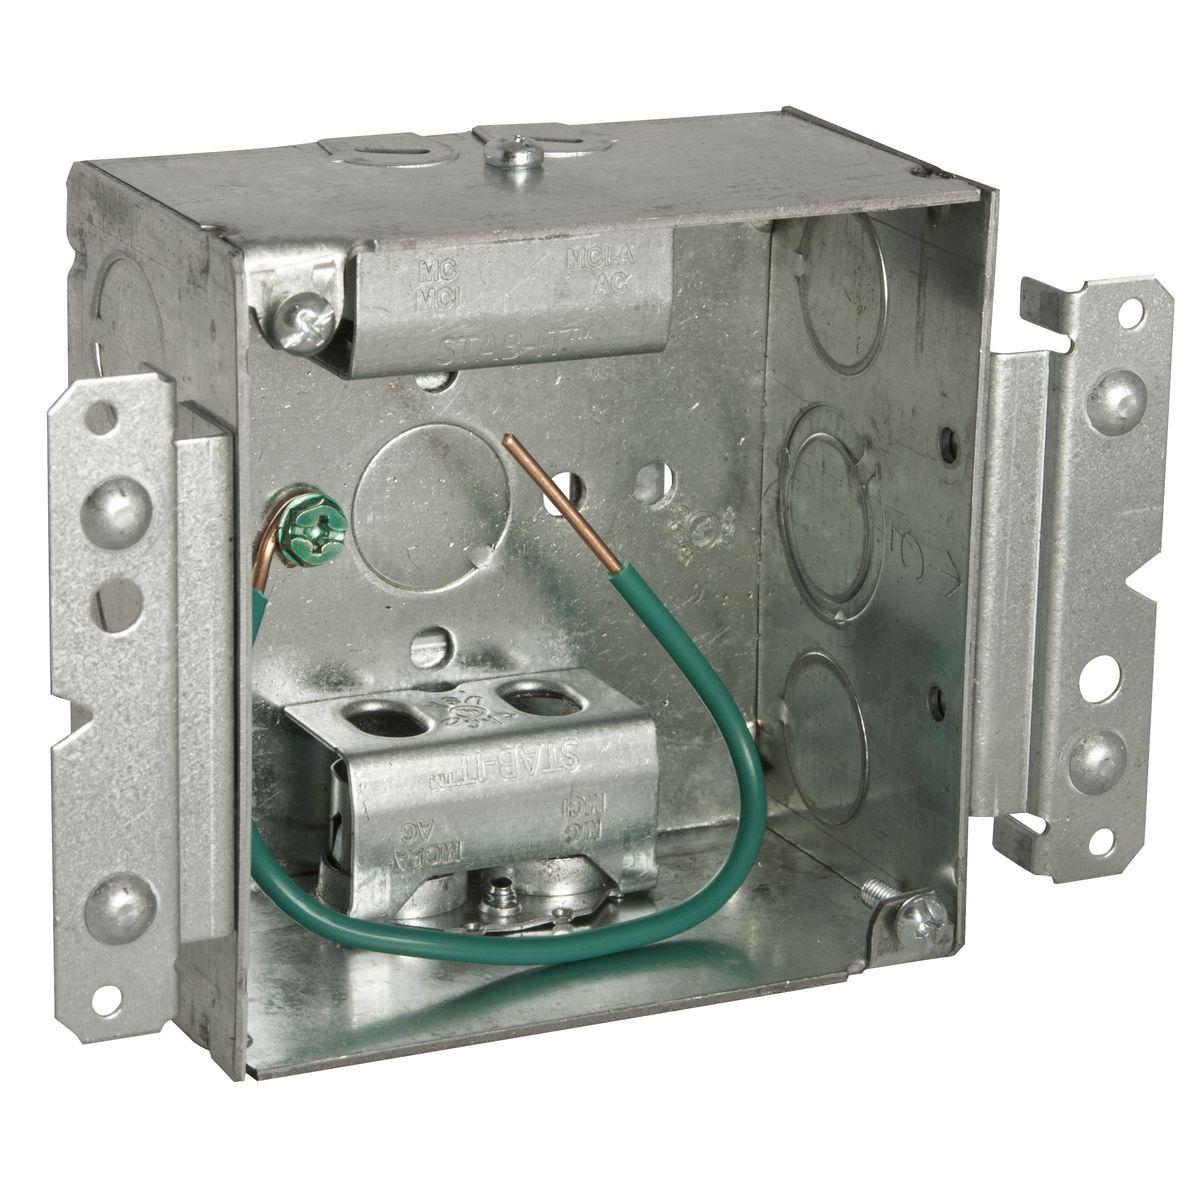 4SQBX 2-1/8DP w/2 STAB-IT CLAMPS